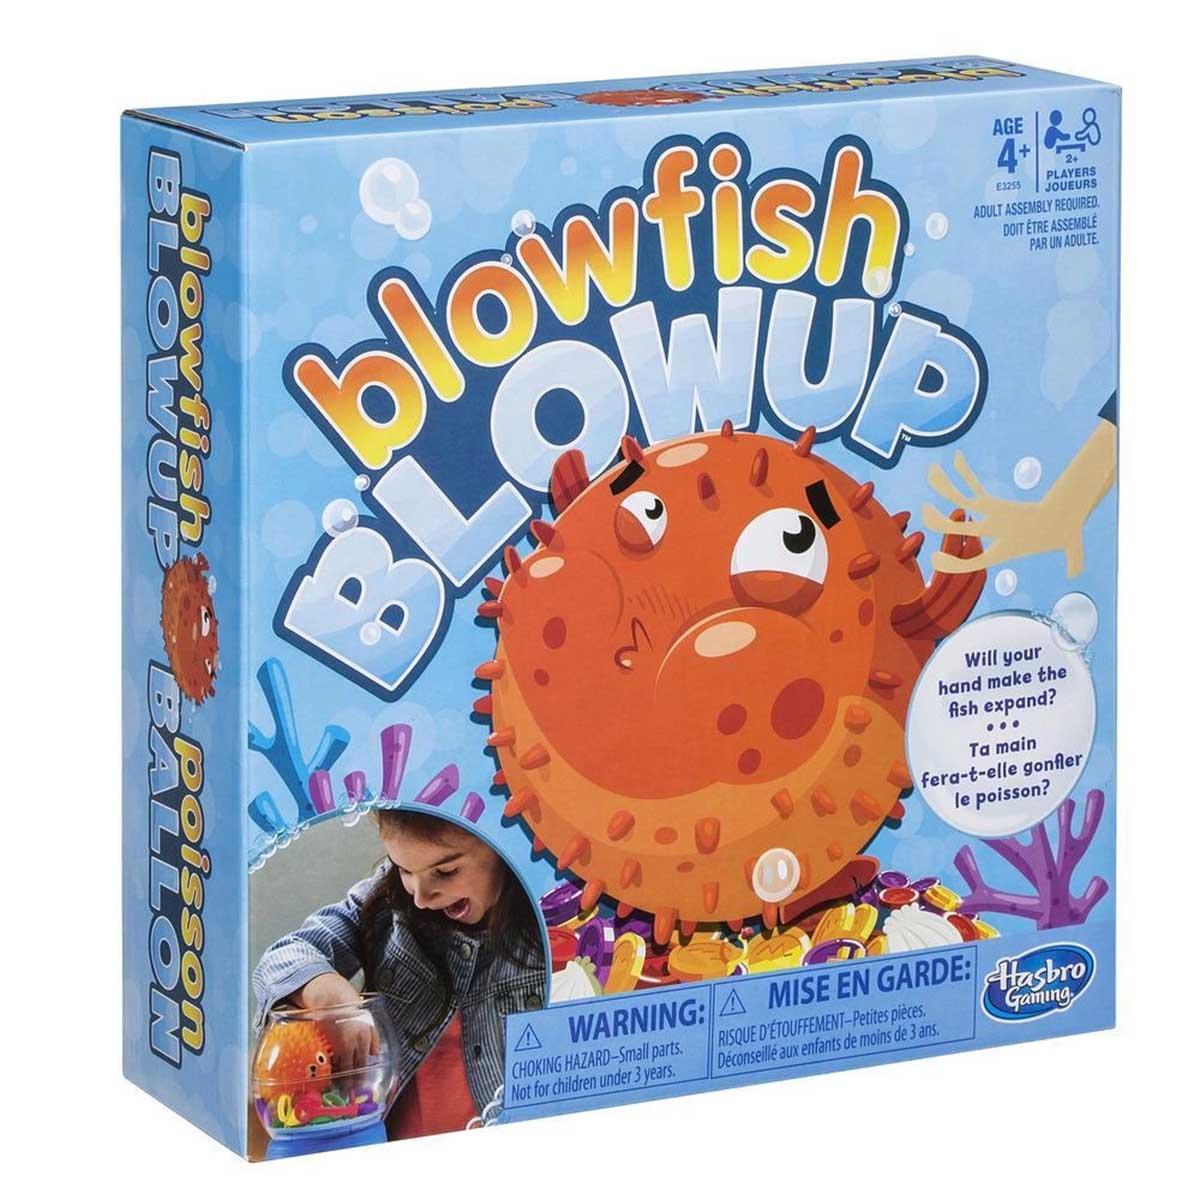 Spel, Blowfish Blowup